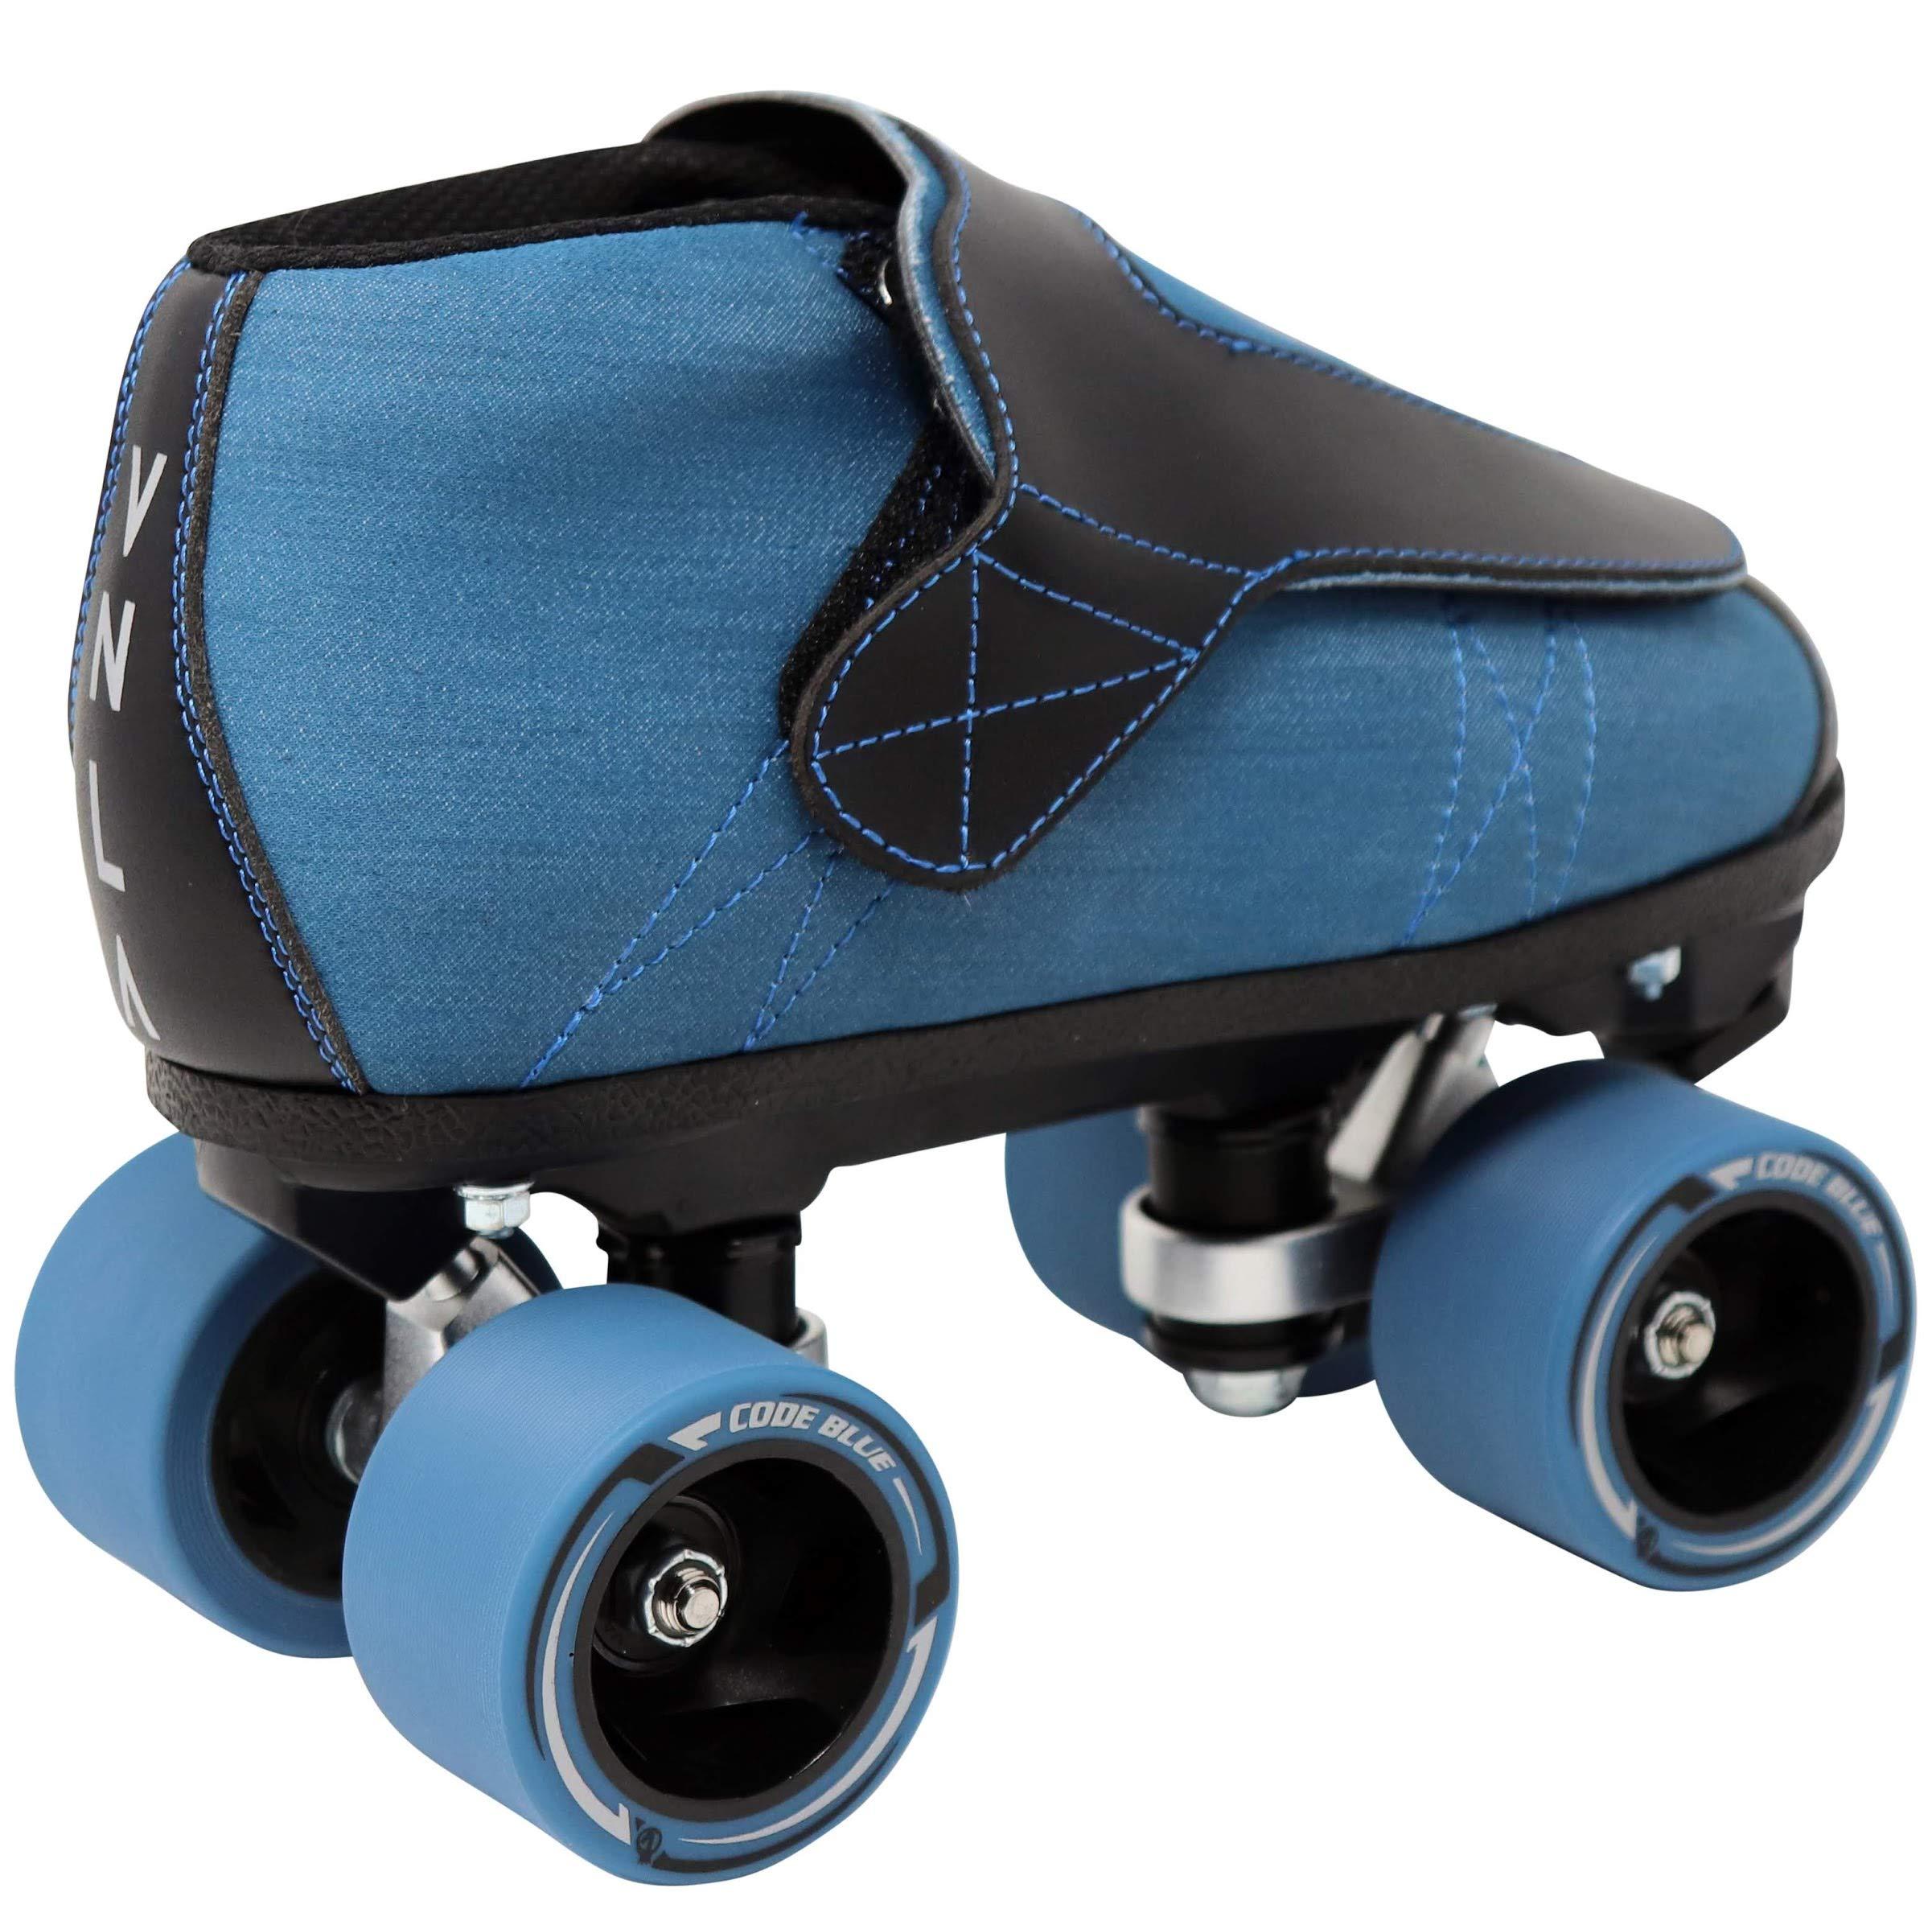 VNLA Code Blue Jam Skate - Mens & Womens Speed Skates - Quad Skates for Women & Men - Adjustable Roller Skate/Rollerskates - Outdoor & Indoor Adult Quad Skate - Kid/Kids Roller Skates (Size 4) by VNLA (Image #3)